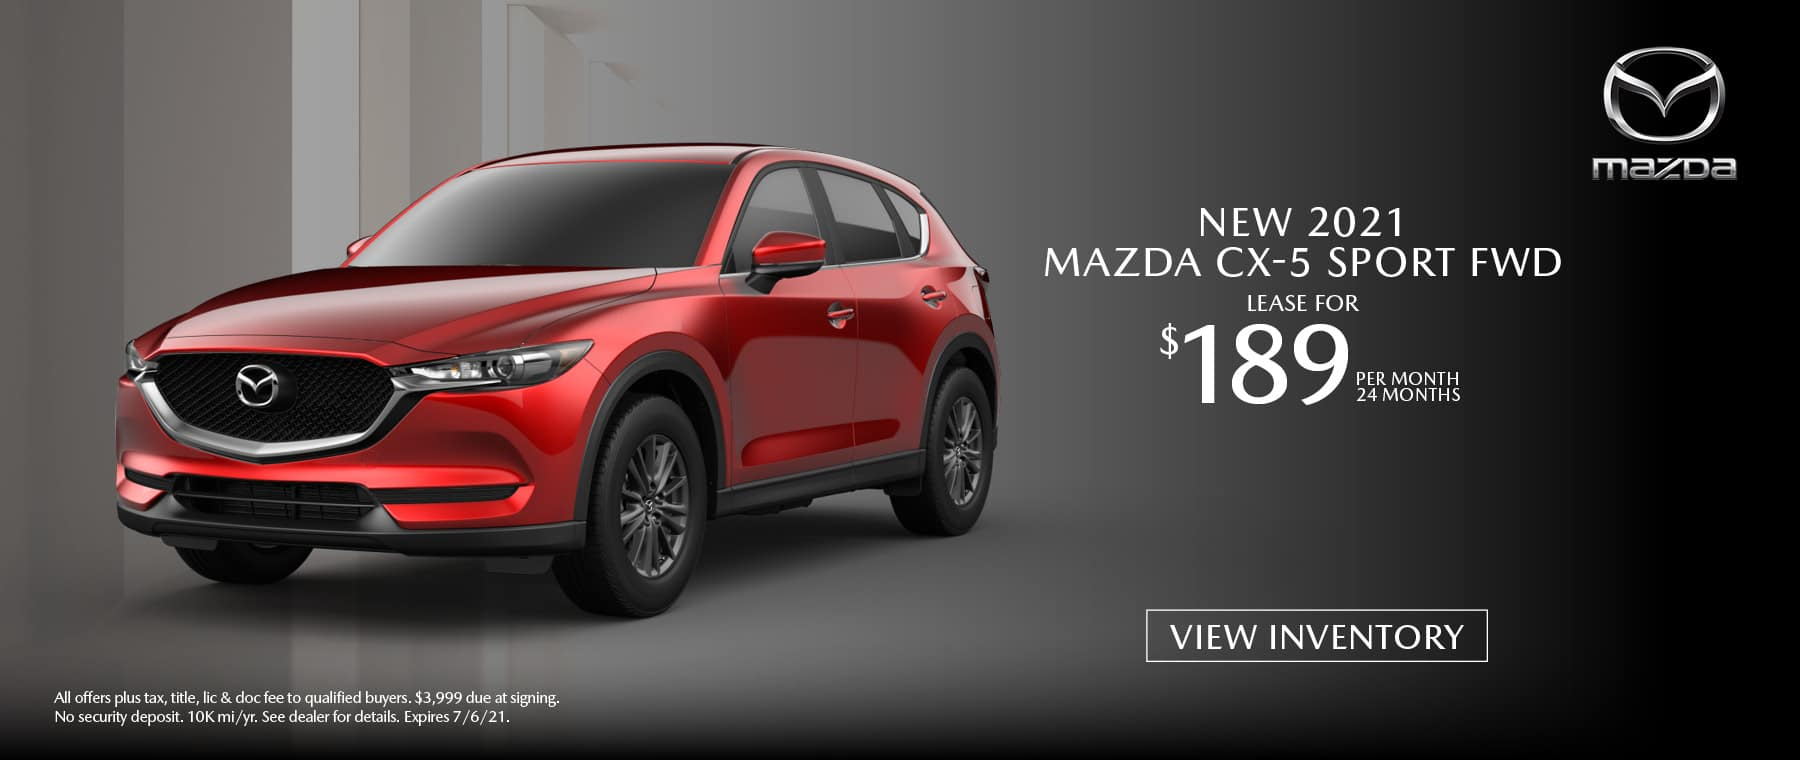 PUGI-MAZ-CX5-$189-JUN-1800×760